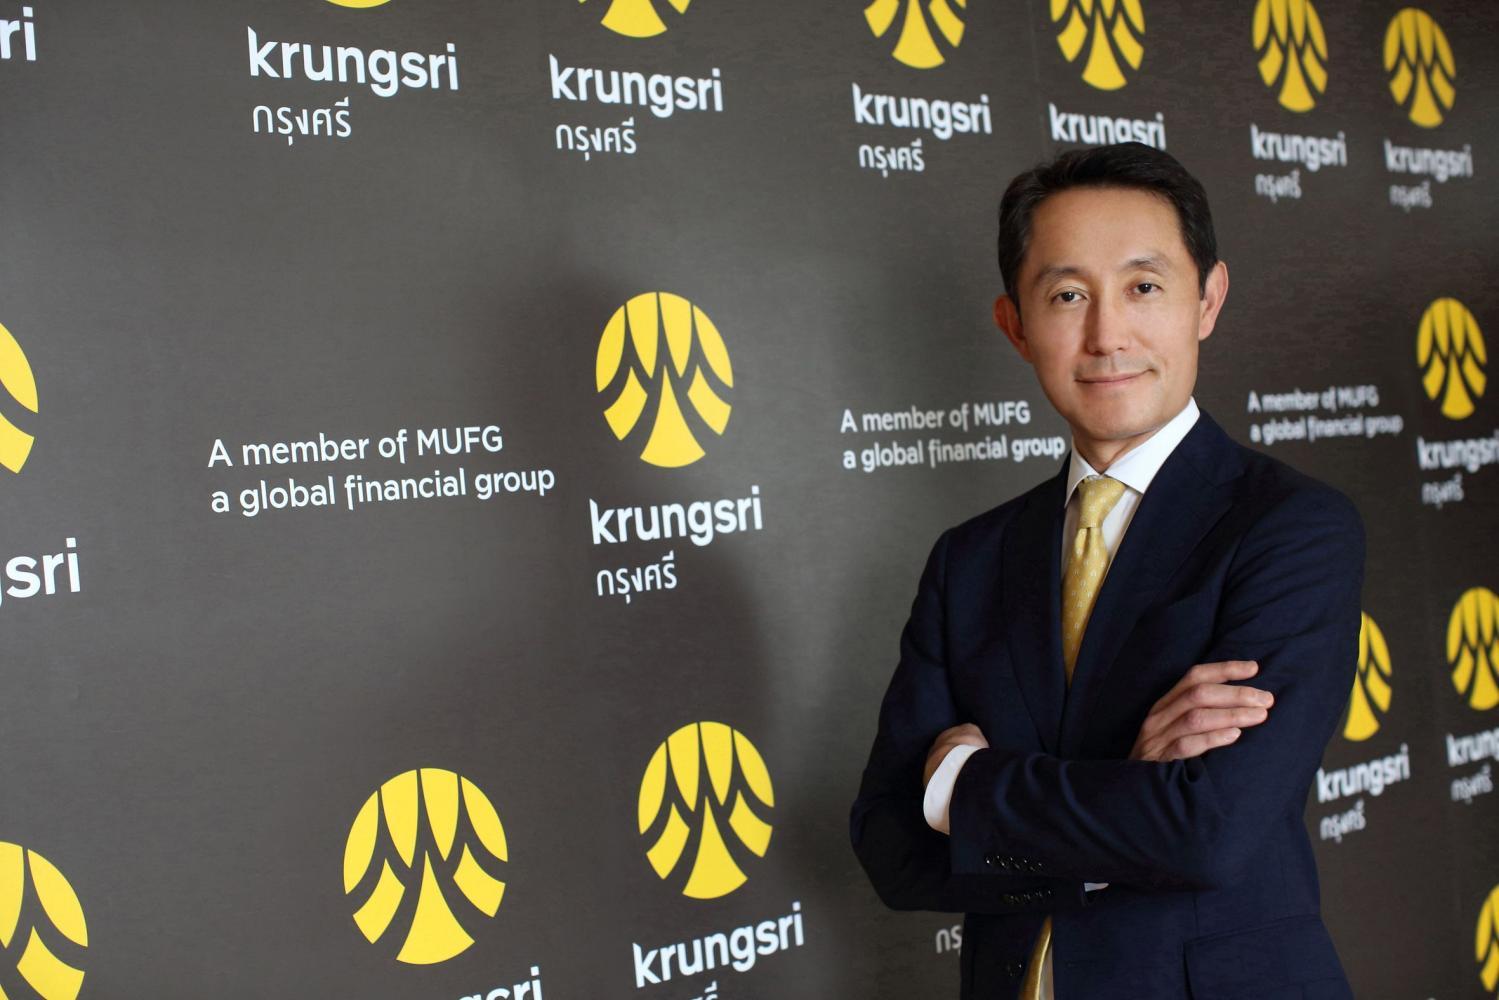 Krungsri president and chief executive officer, Mr. Seiichiro Akita. *No photo credit*